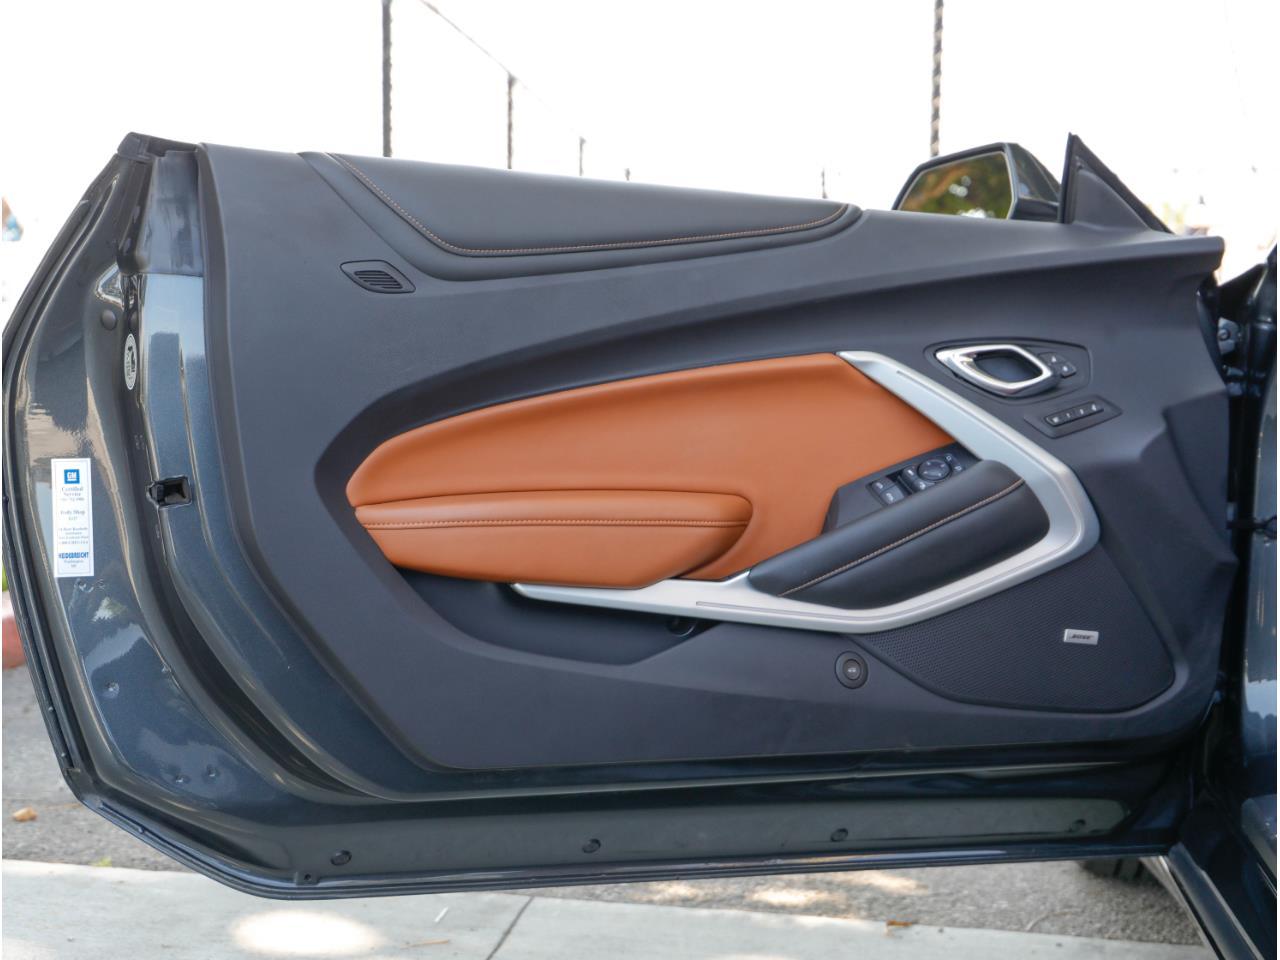 2016 Chevrolet Camaro RS (CC-1234600) for sale in Marina Del Rey, California